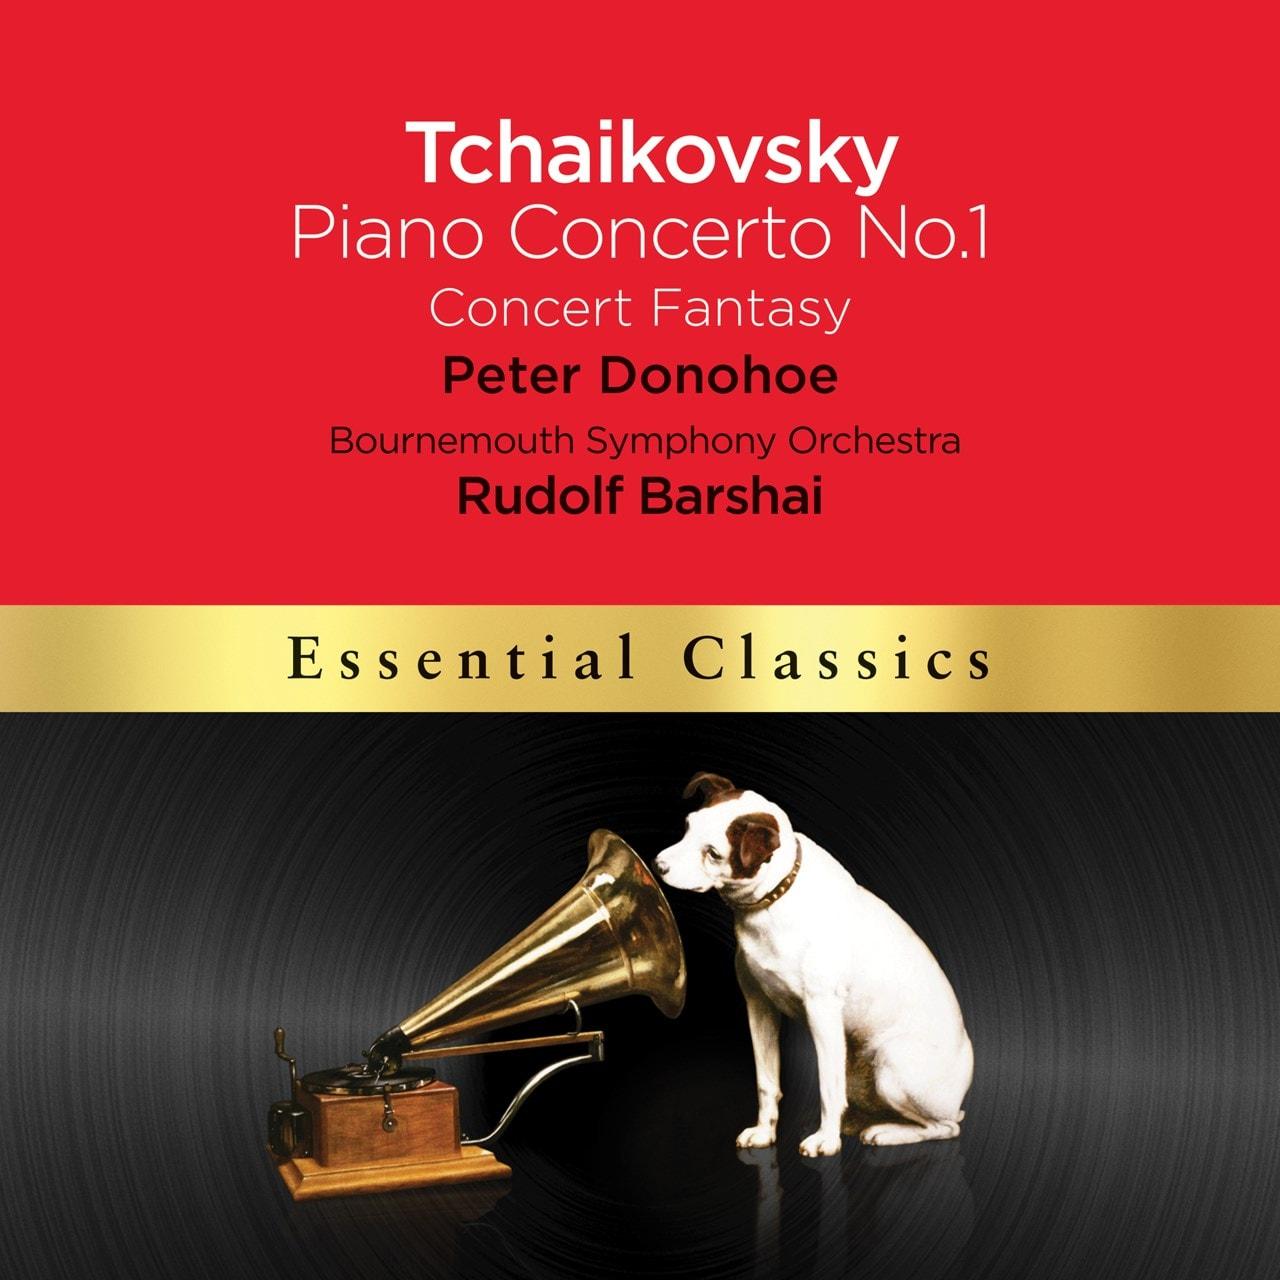 Tchaikovsky: Piano Concerto No. 1/Concert Fantasy - 1